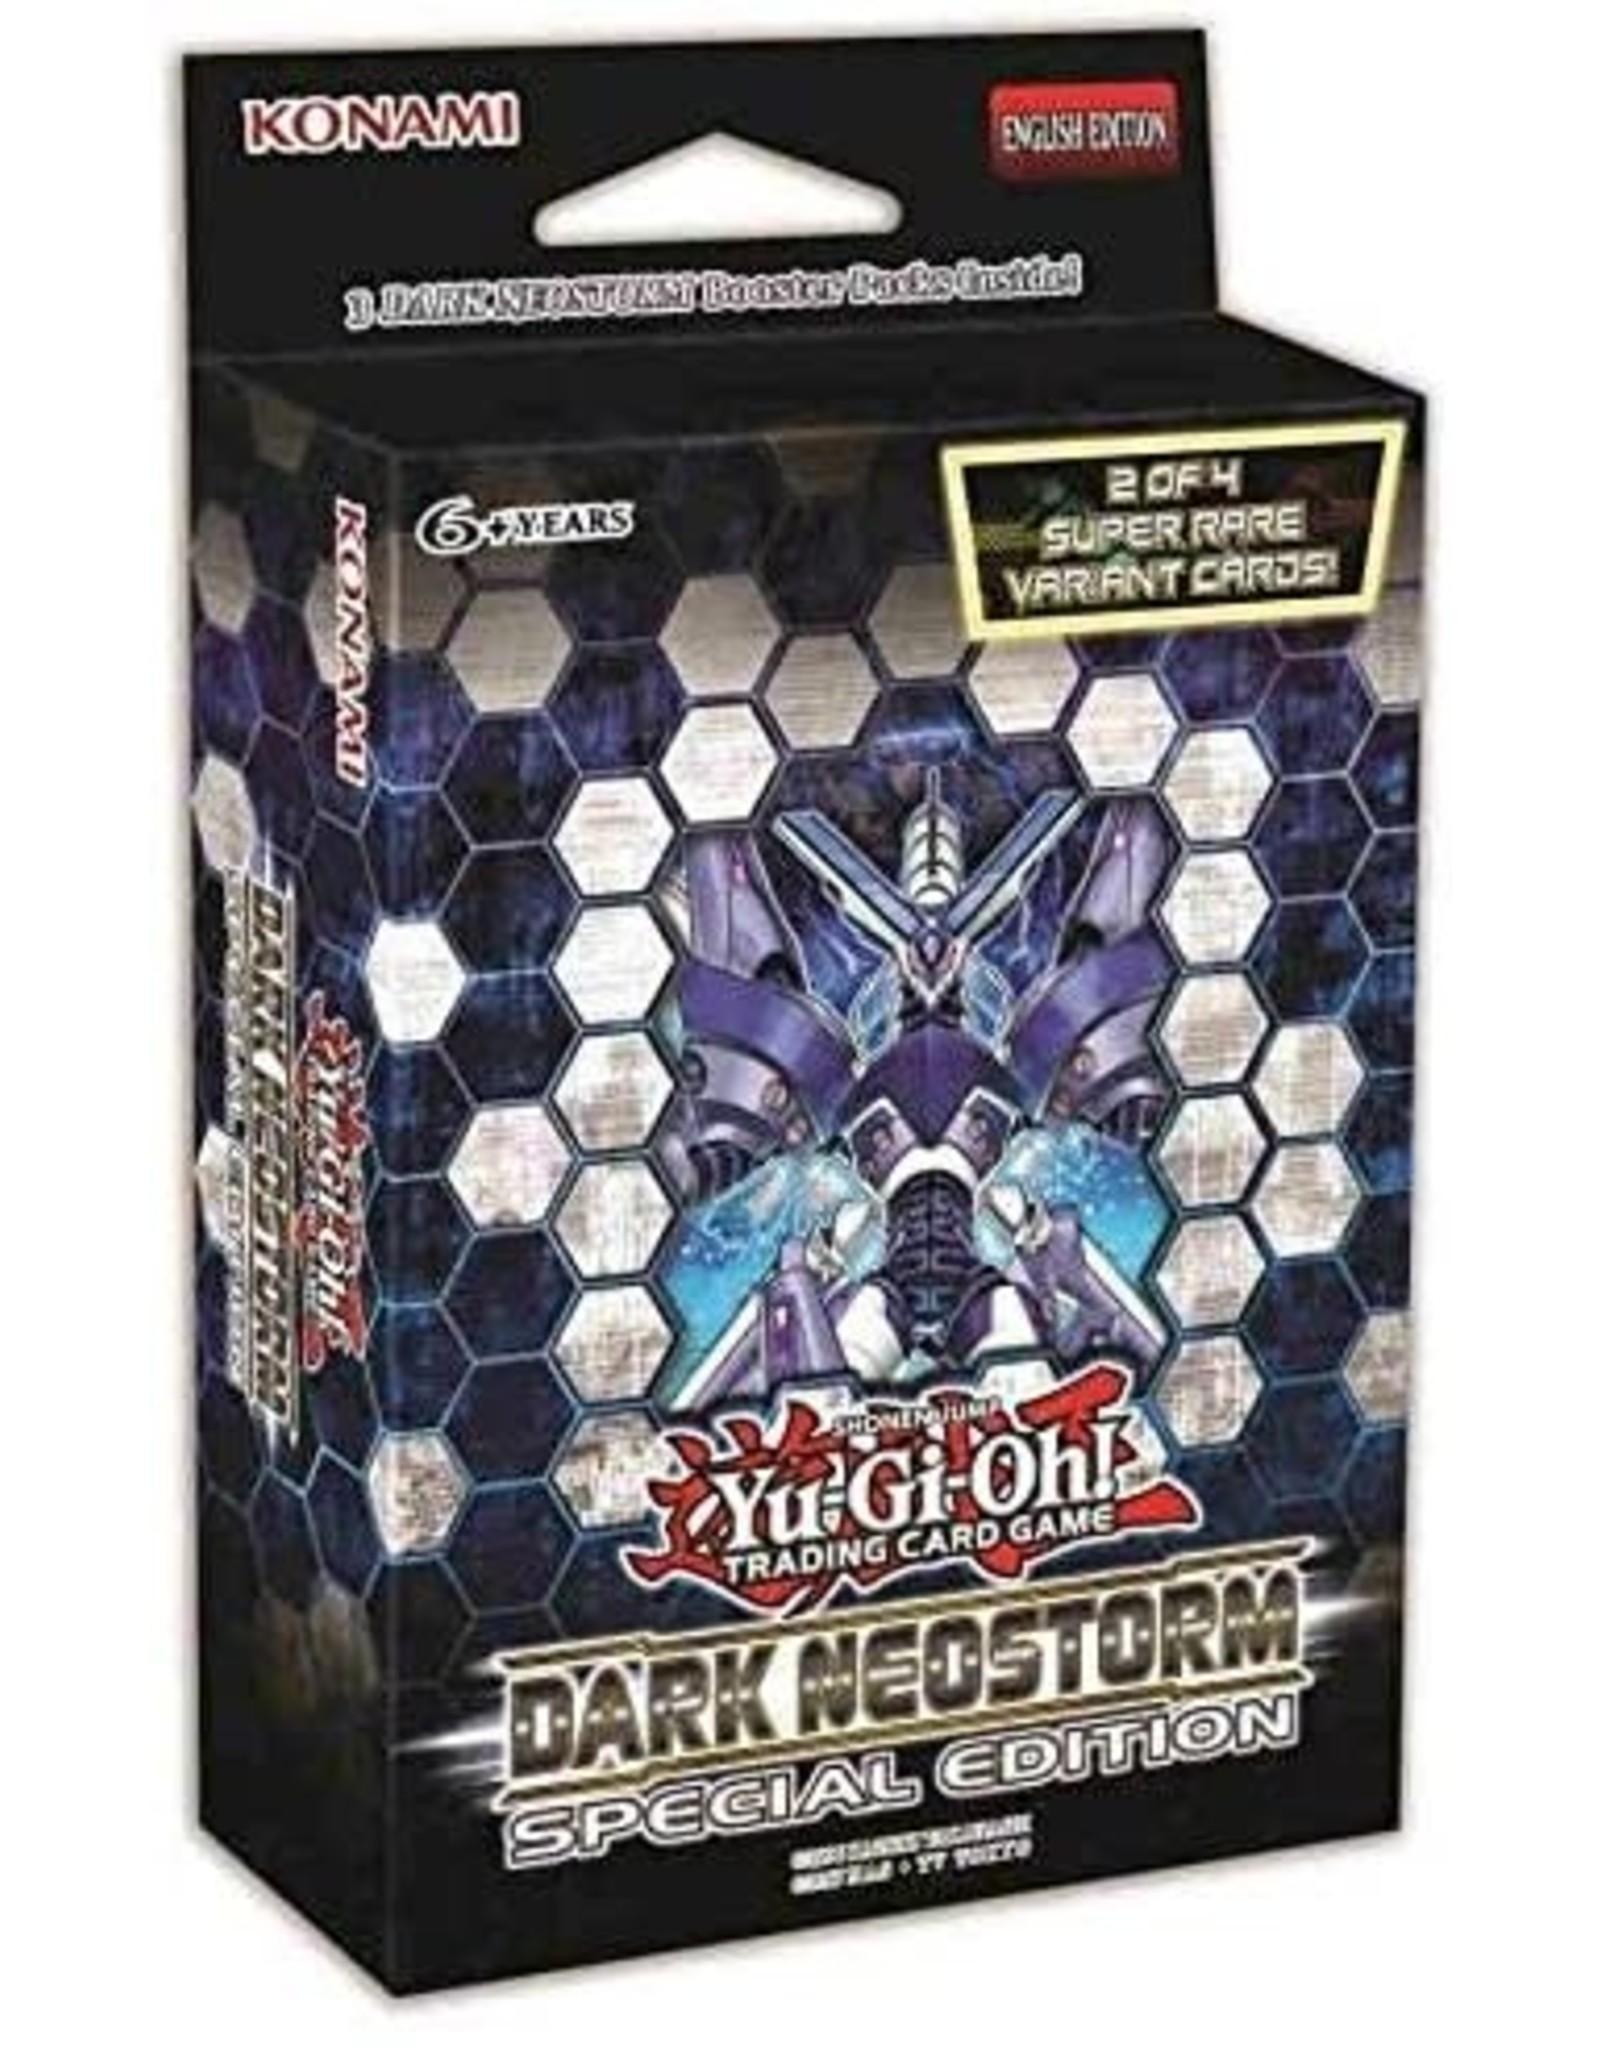 Konami Yu-Gi-Oh! Dark Neostorm Special Edition Set